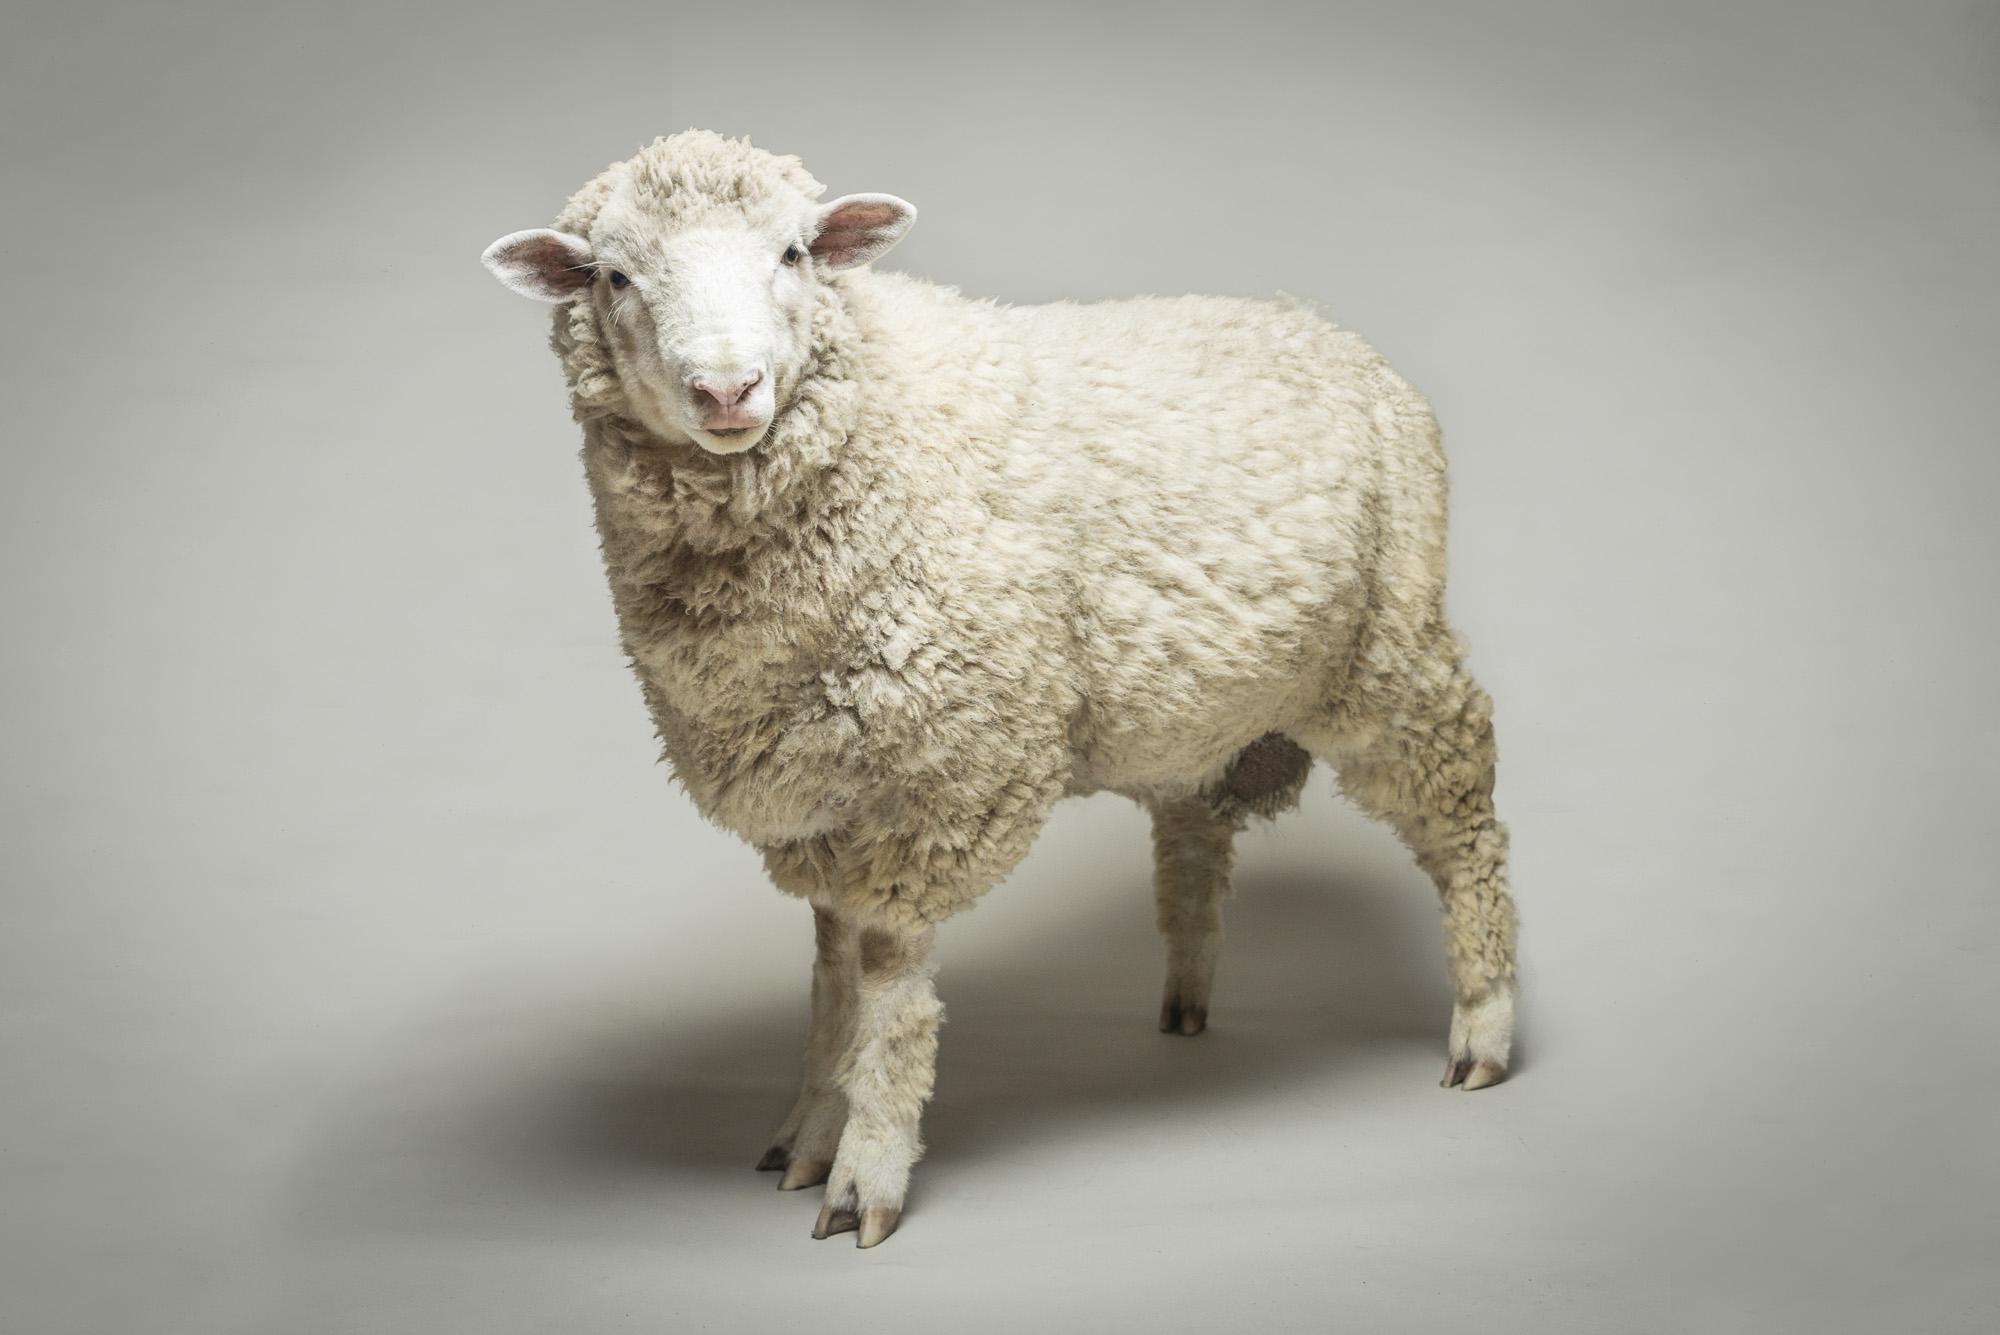 LupinBay-0116-Sheep-Ram-Pet-Photography-1227.jpg